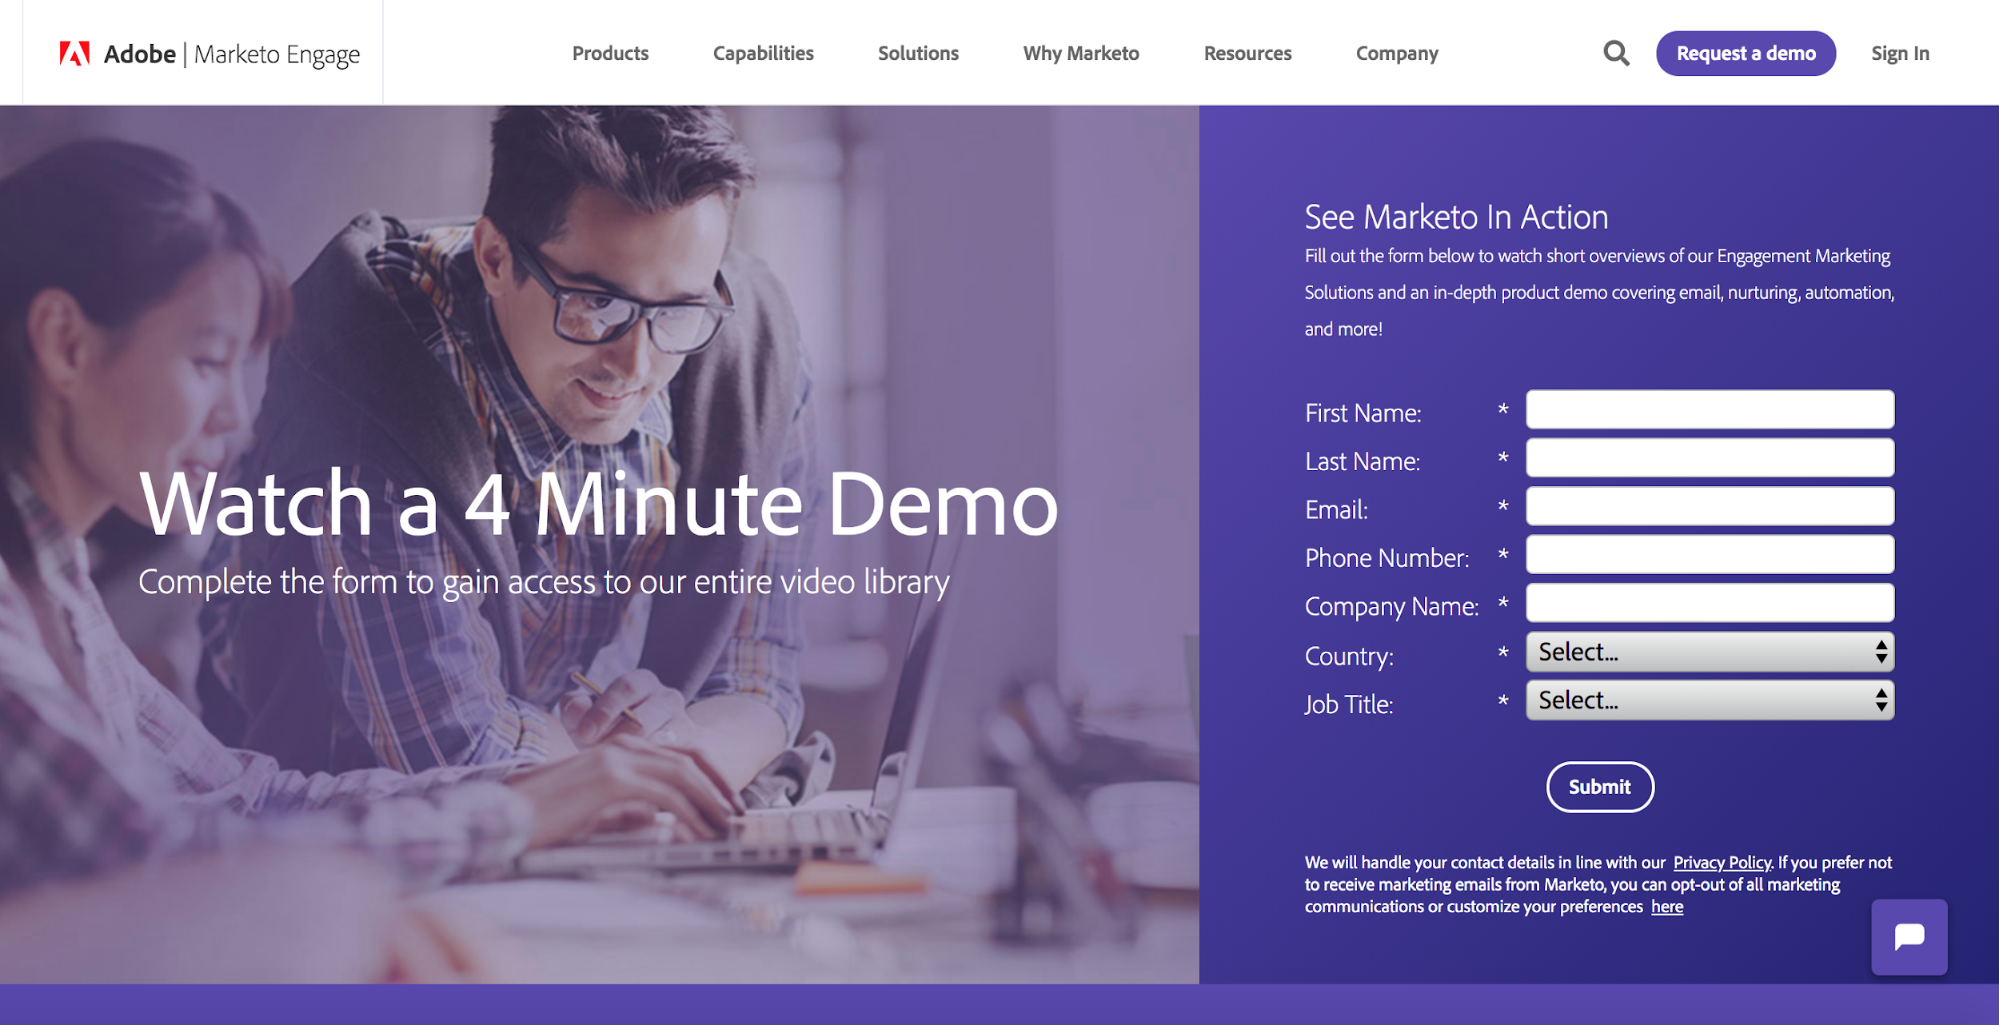 Adobe Marketo Landing Page